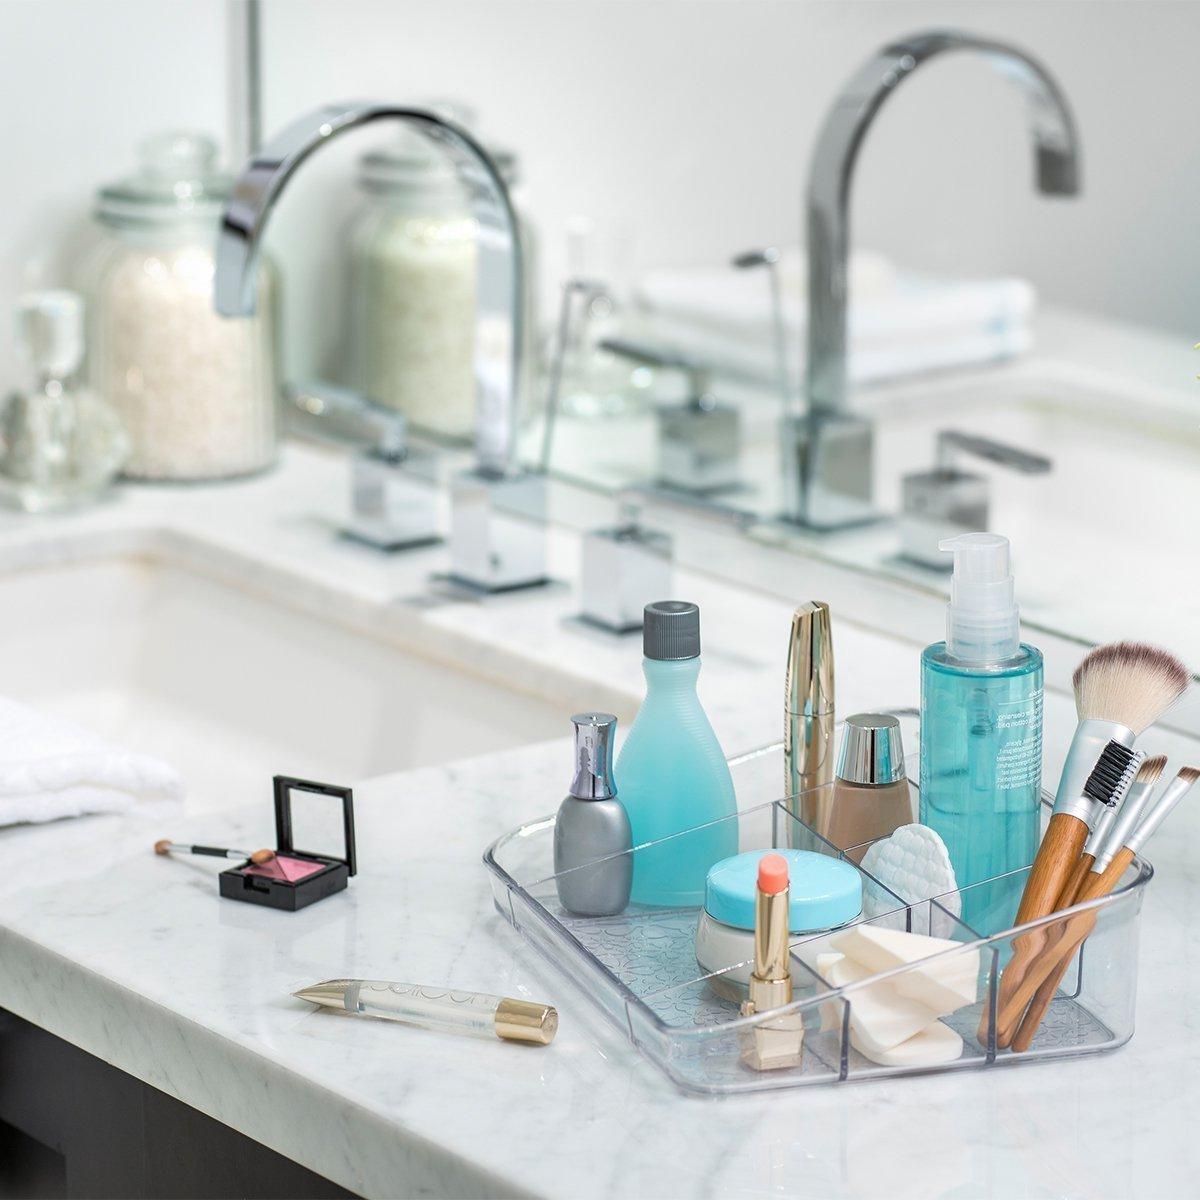 Amazon.com: Better Living Set of 4 Vanity Trays for Bathroom Storage ...